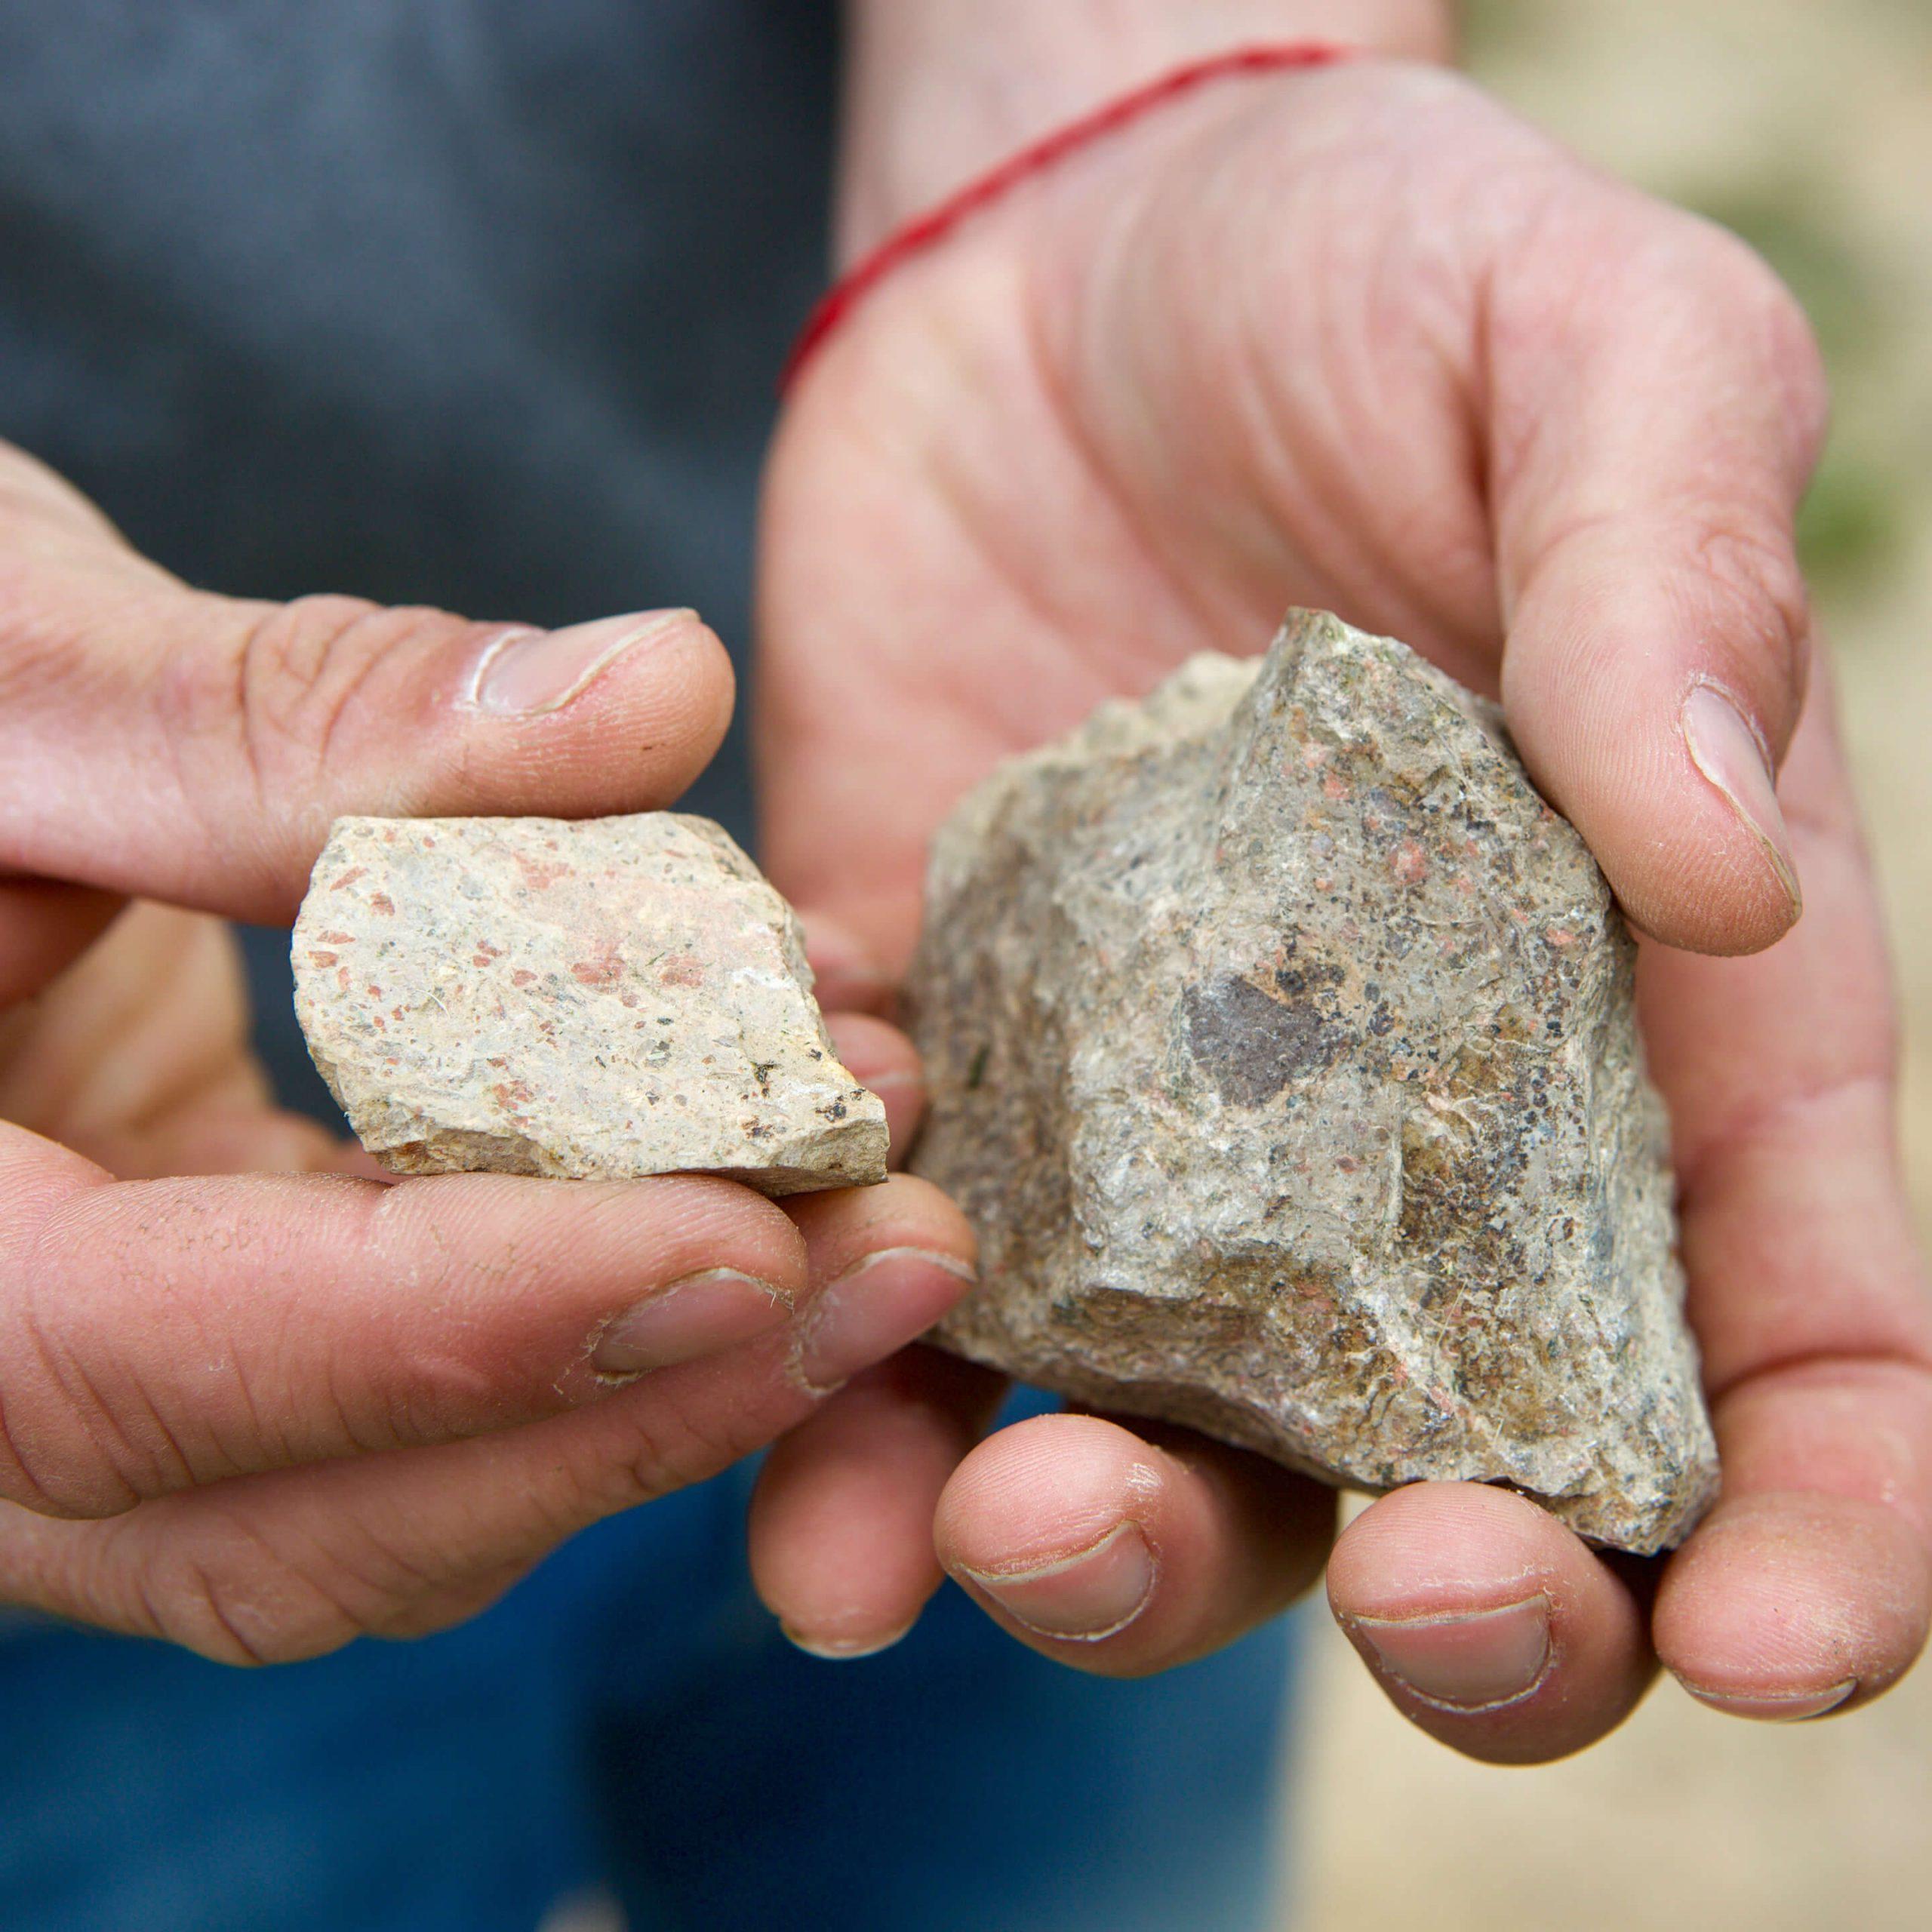 Volcanic rocks from Davide Carlone's vineyards in Boca, Alto Piemonte, and the hands of Cristiano Garella.